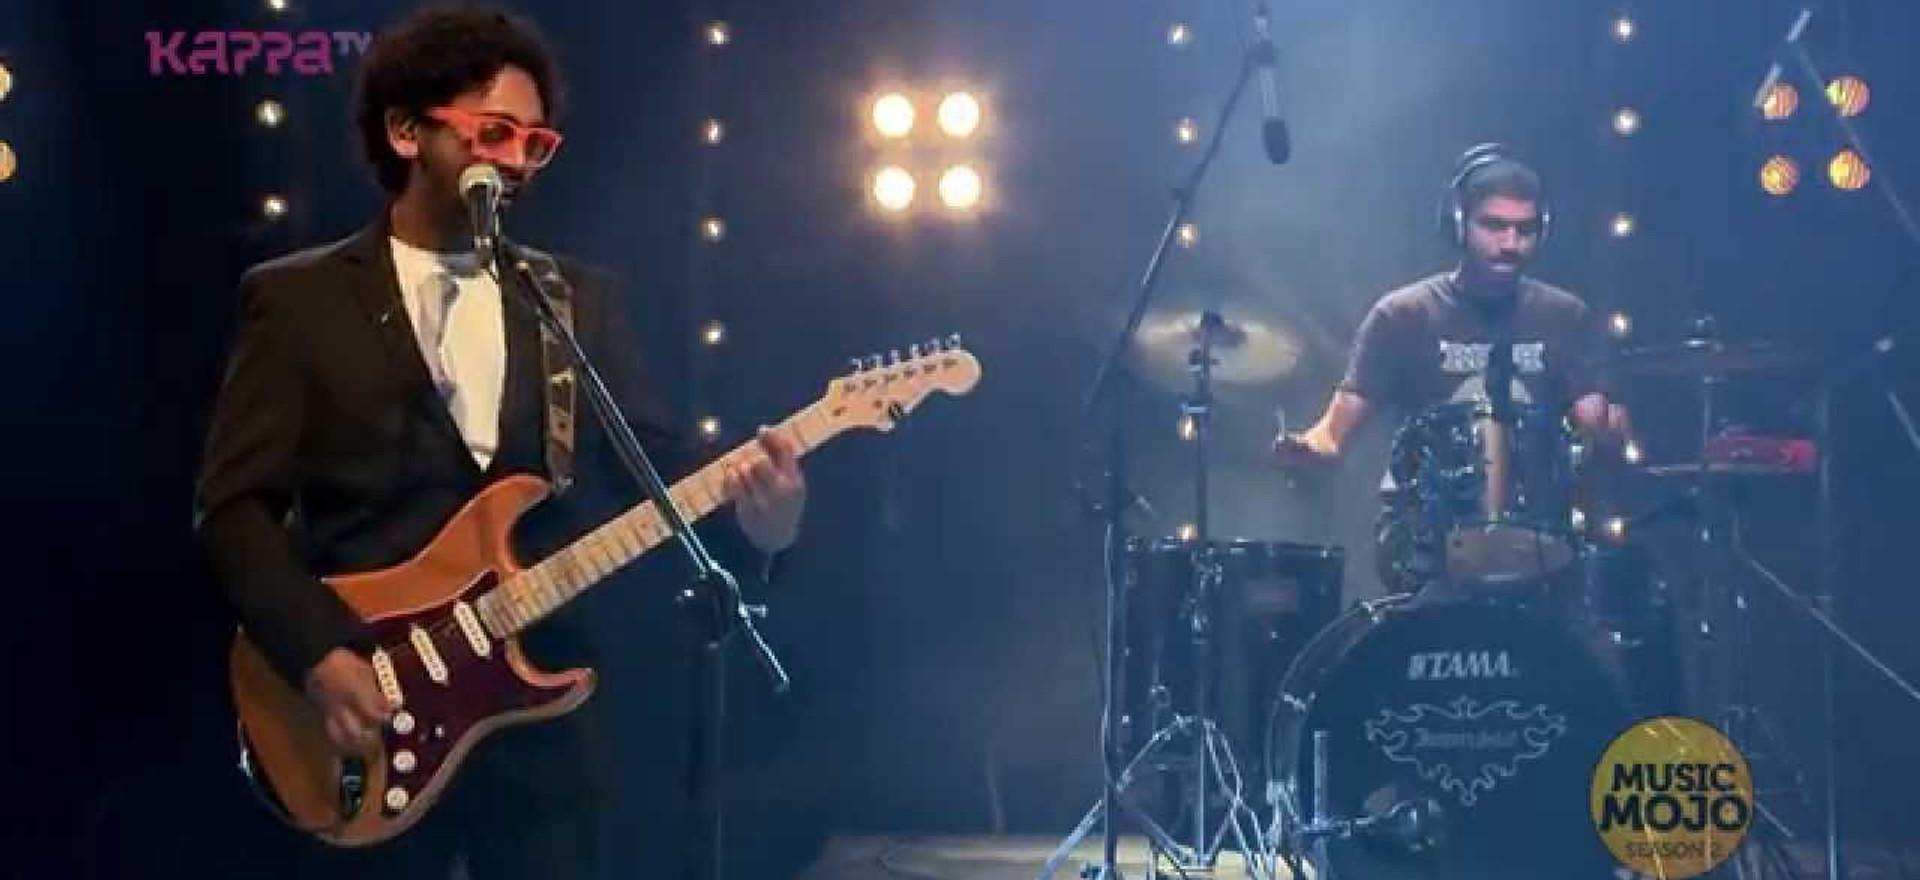 Break My Fall - Mad Orange Fireworks - Music Mojo Season 2 - Kappa TV